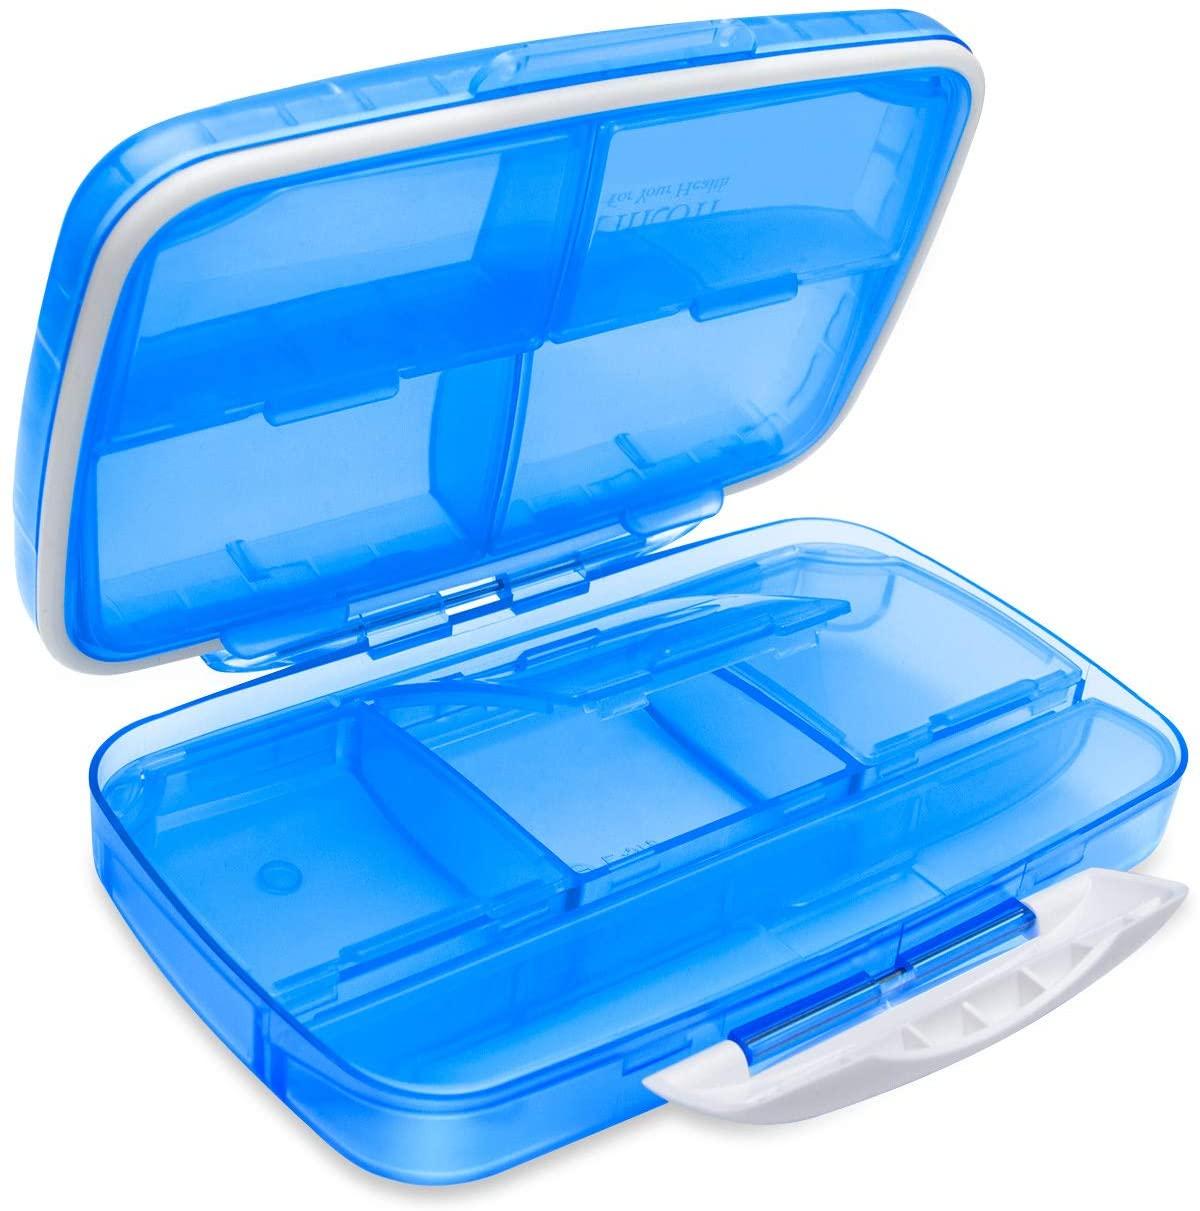 Travel Pill Organizer Large Portable Medication Organizer, Fullicon Oversize 8 Compartment Pill Box, Vitamin Travel Case Pill Holder - Airtight & Moistureproof (Blue)